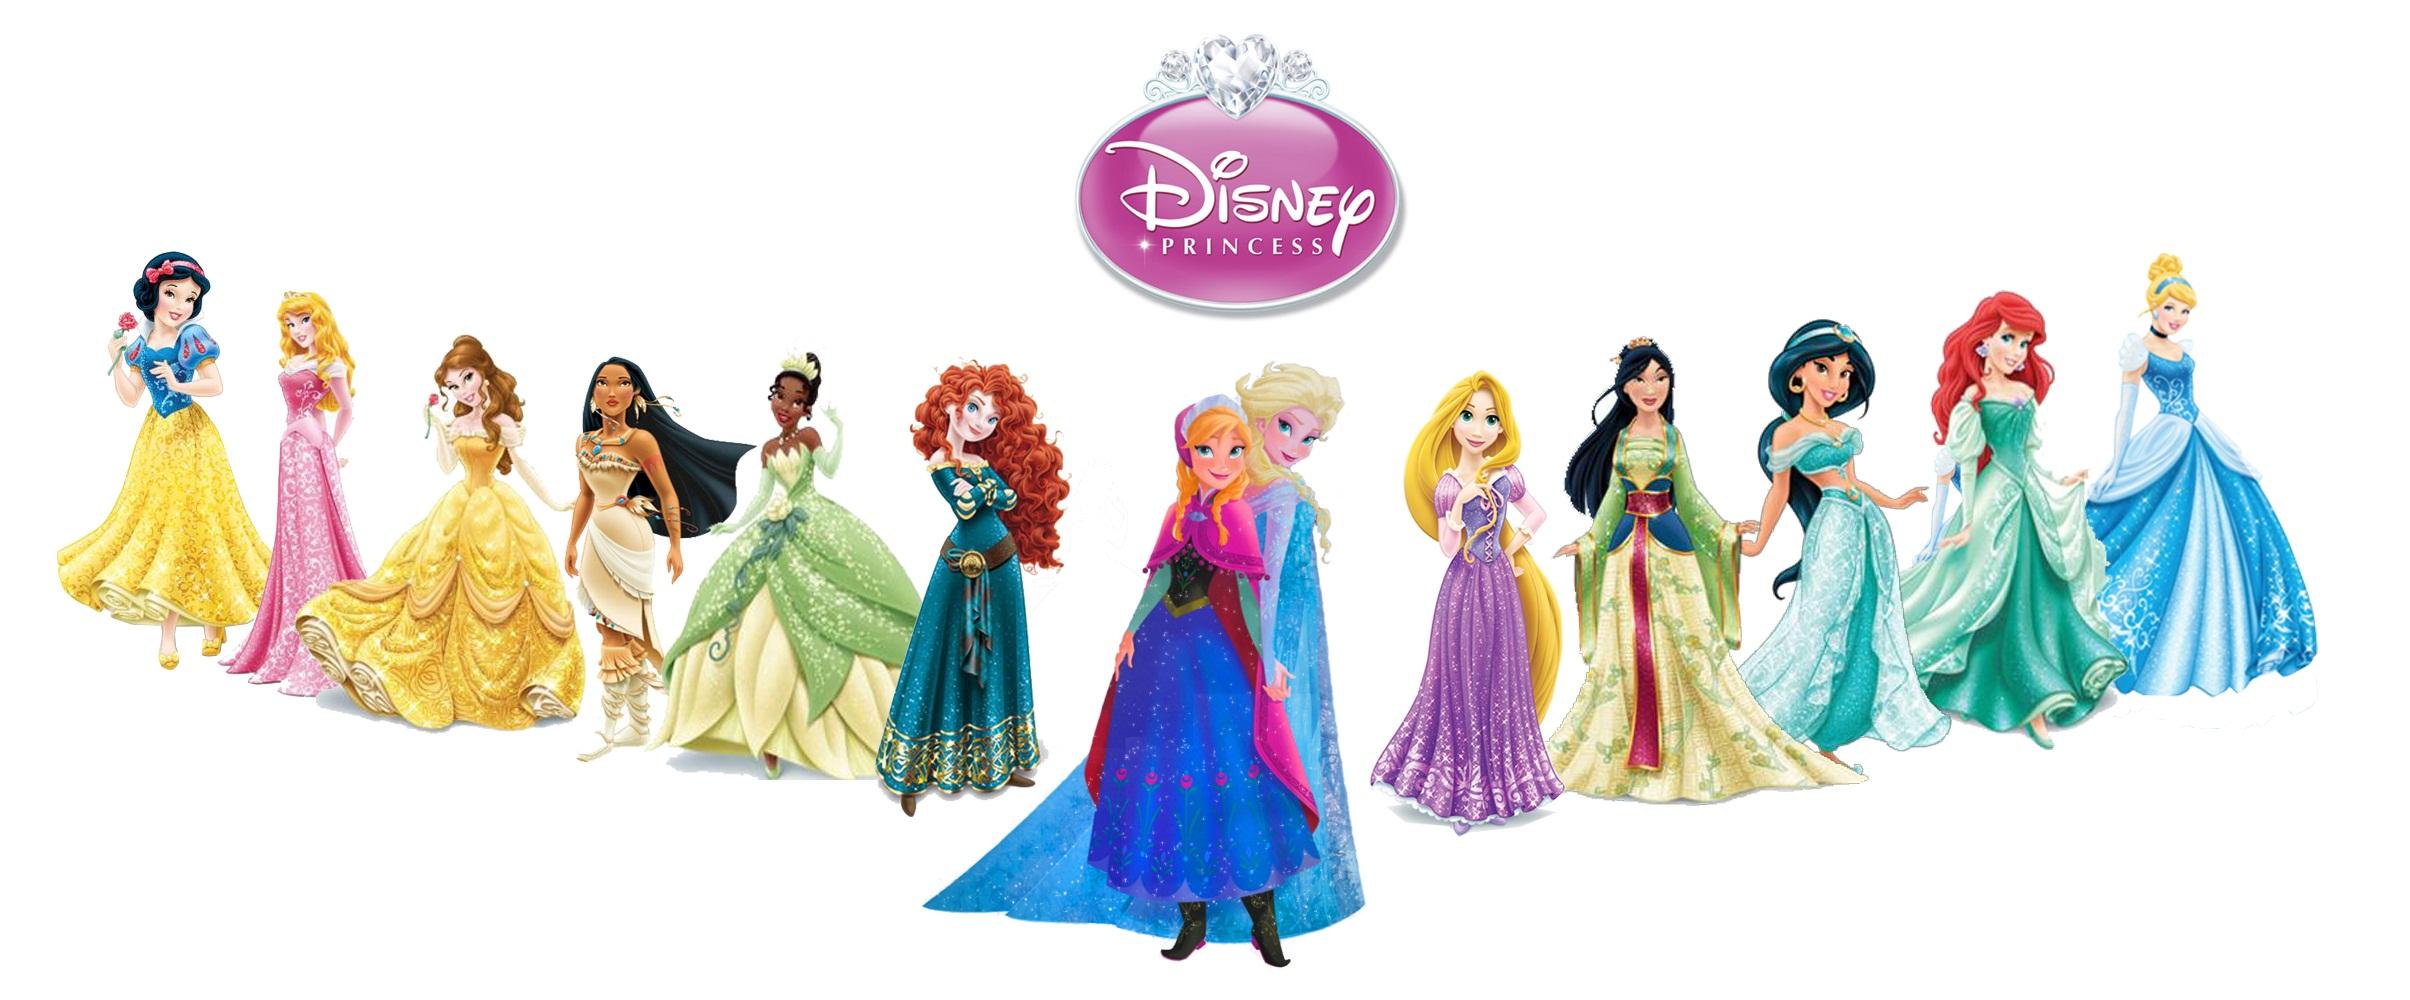 File:disney Princess Lineup